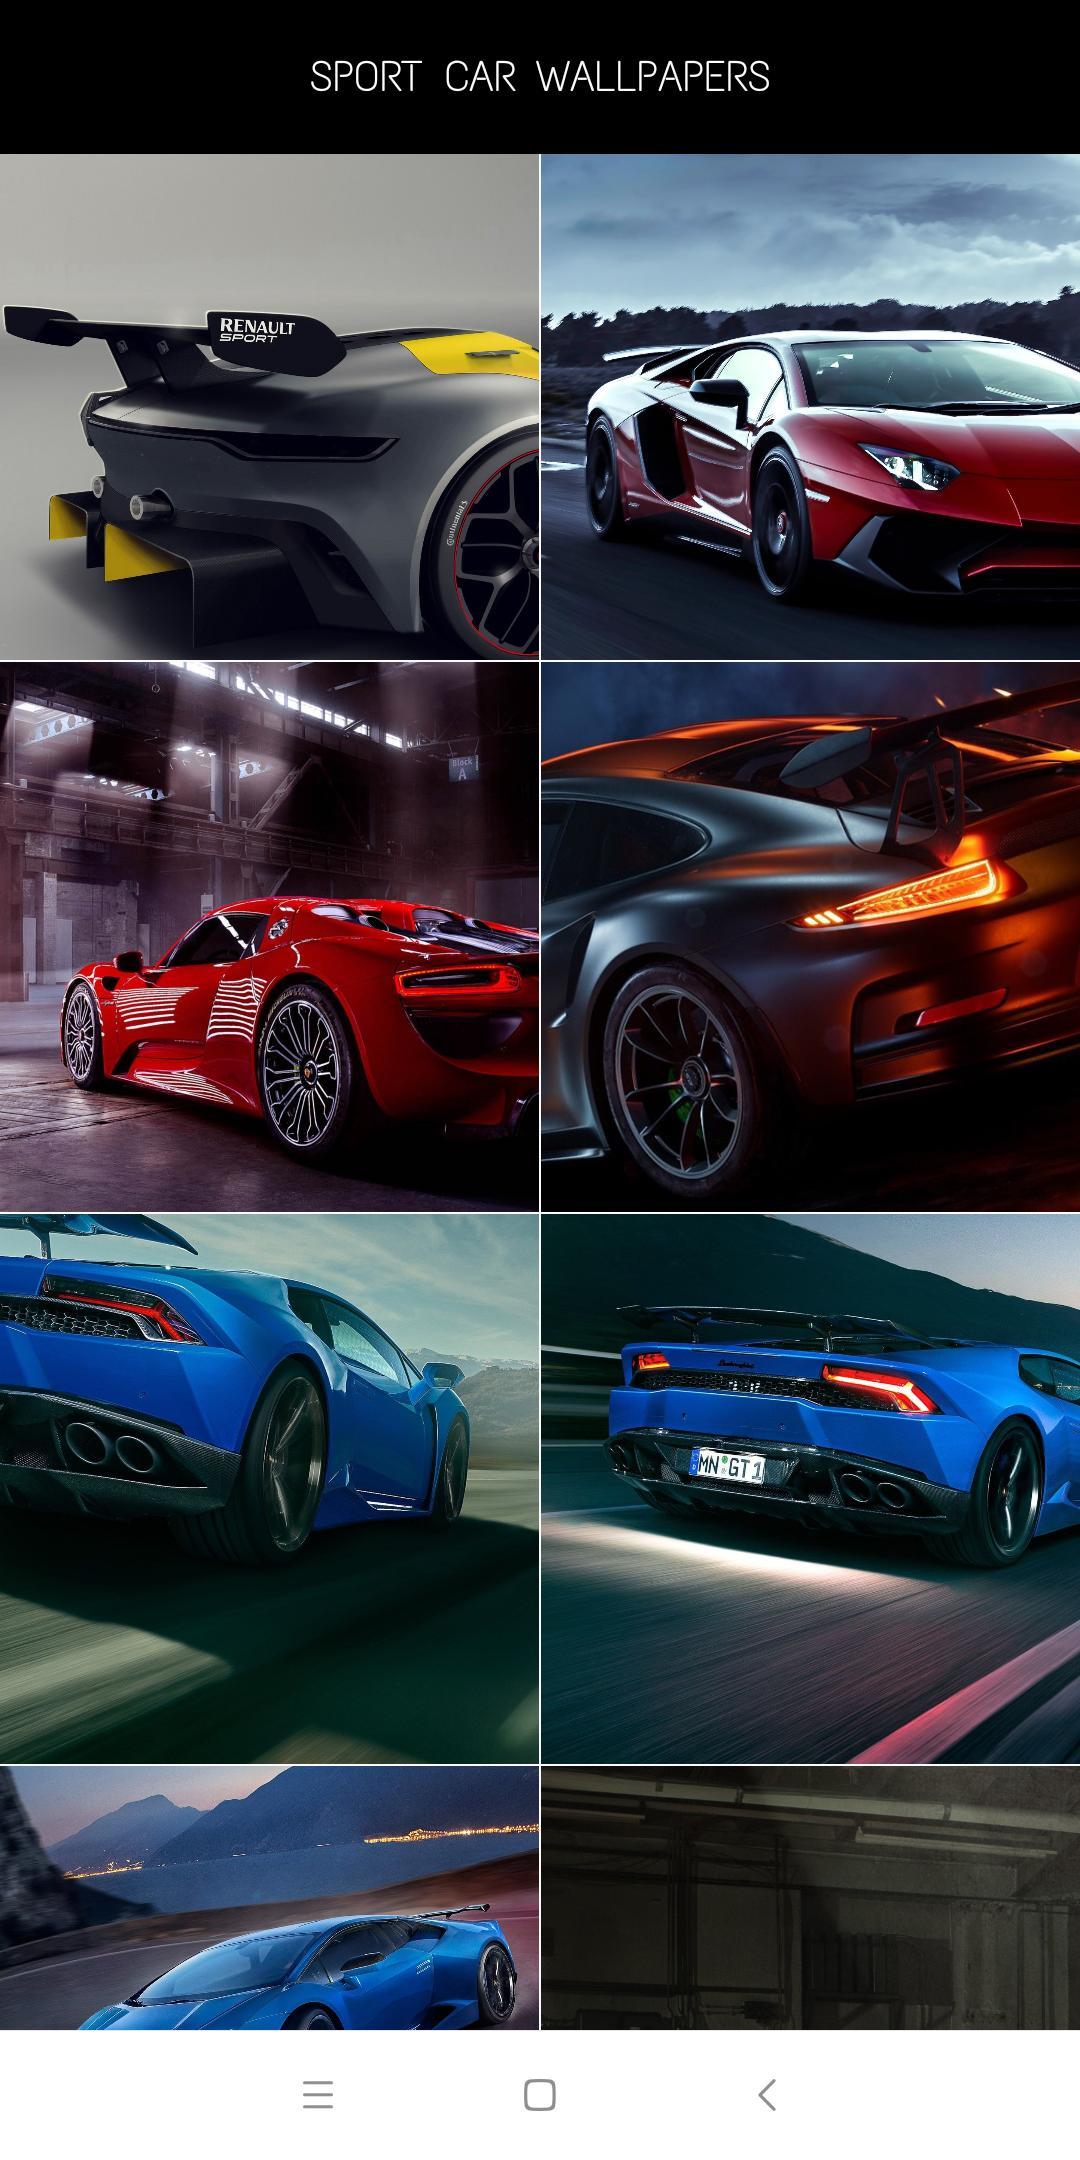 Dark Sport Cars HD Wallpaper Offline for Android - APK ...